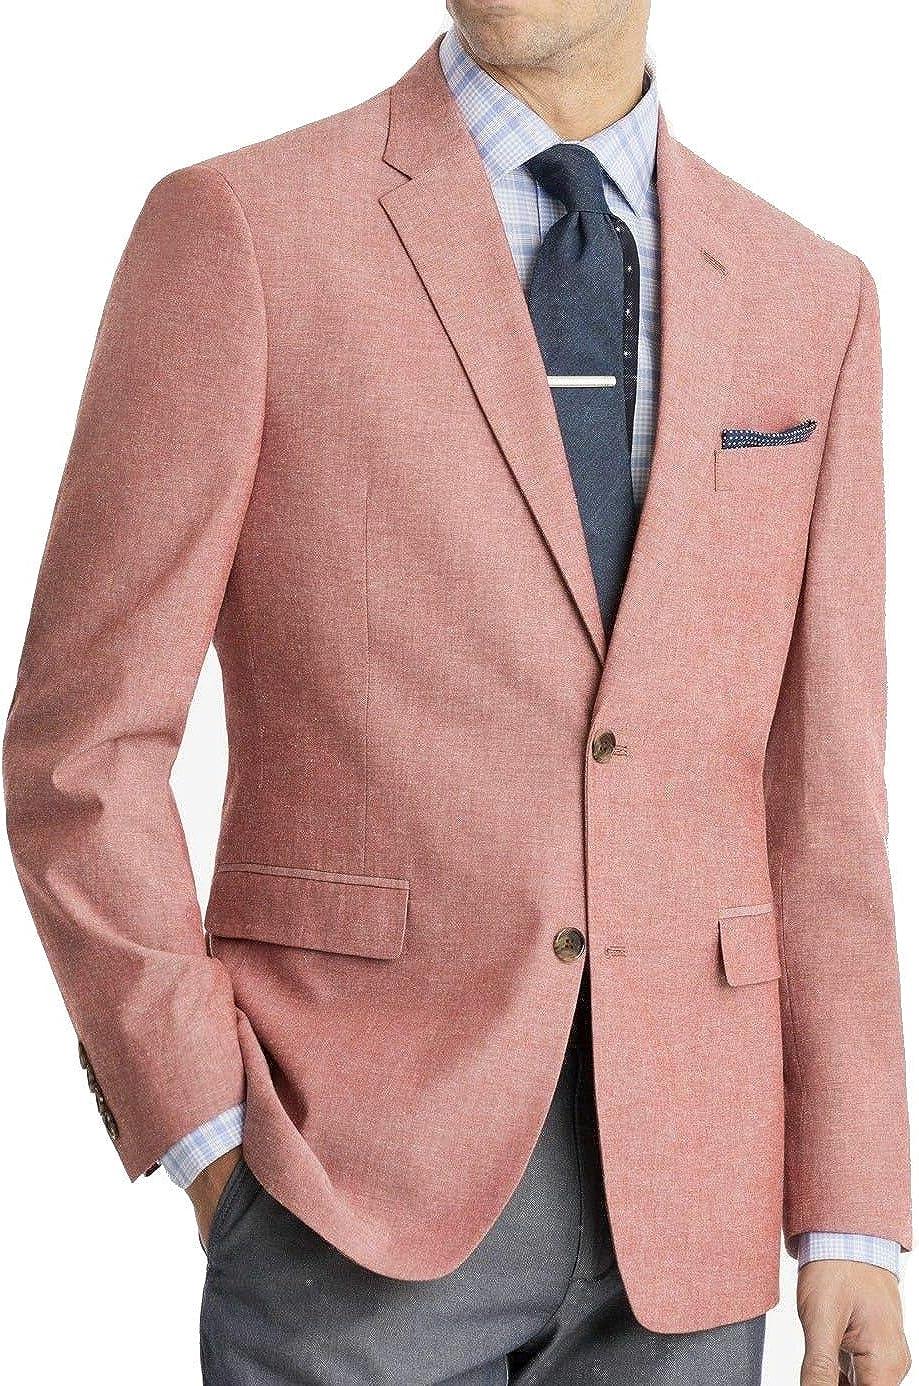 Tommy Hilfiger Men's Modern Fit Seersucker Suit Separates-Custom Jacket & Pant Size Selection